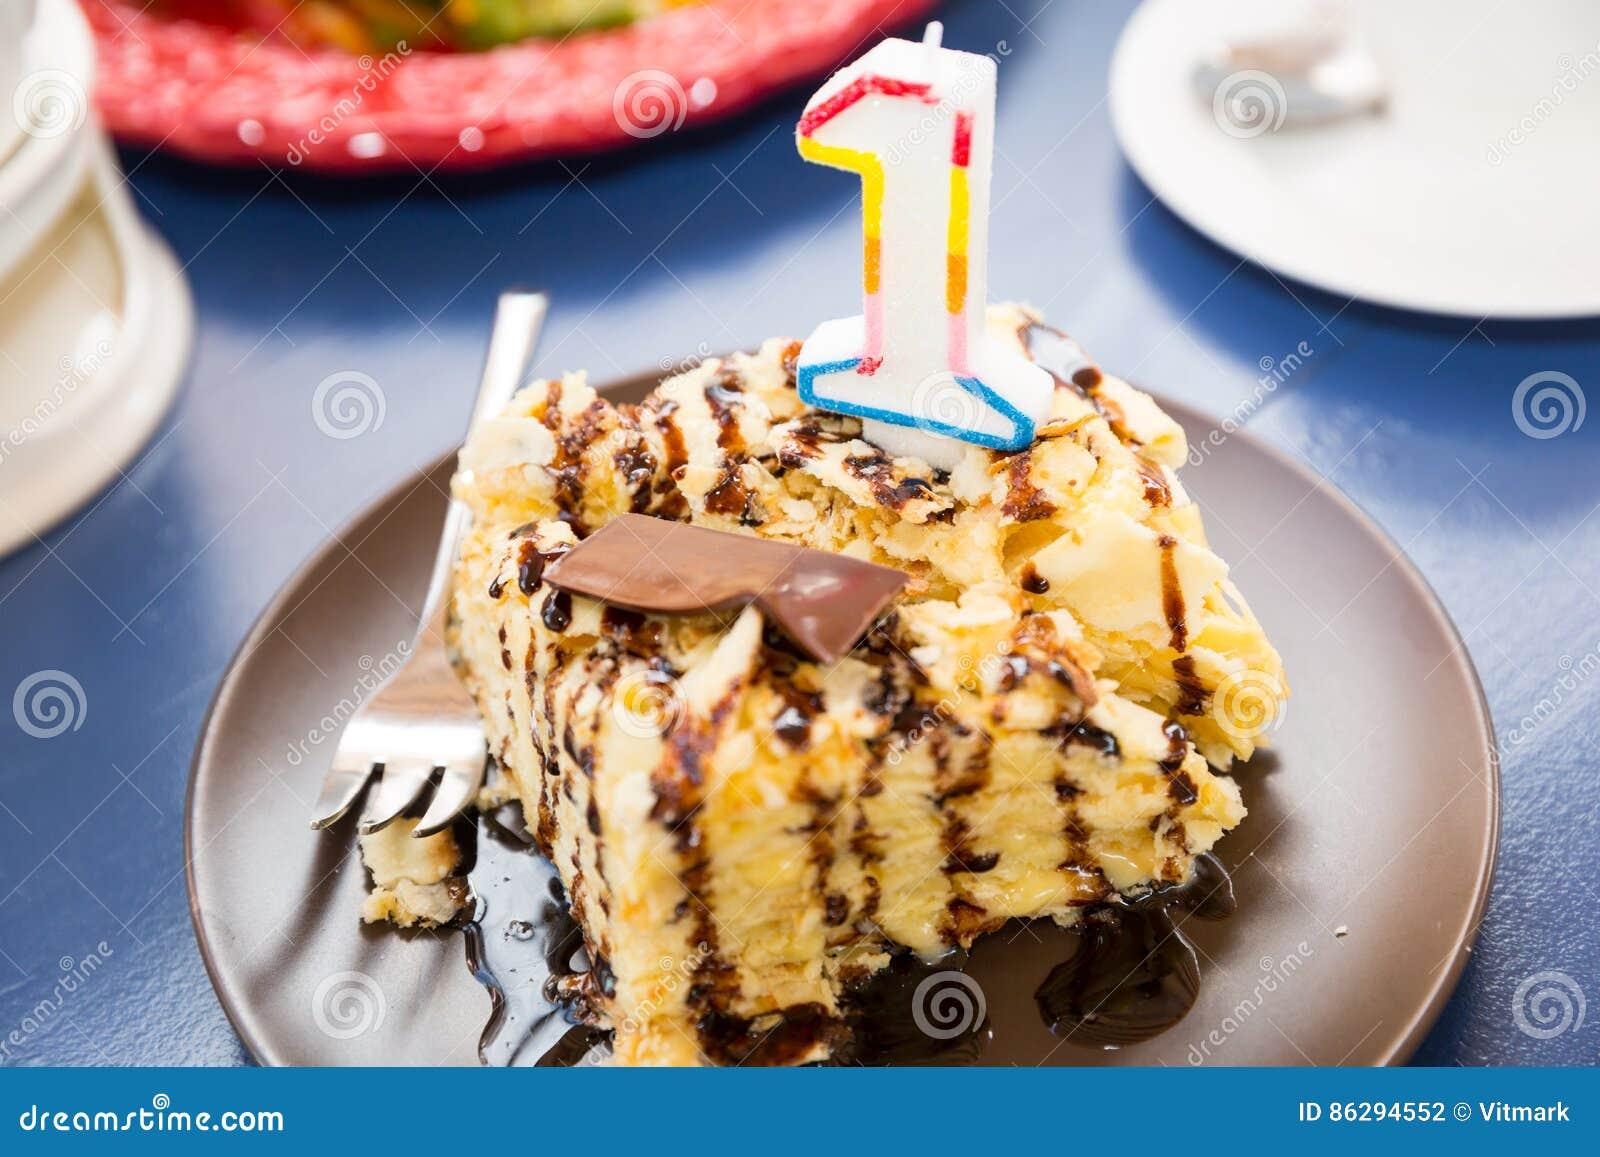 One year cake. Birthday cupcake with number one. Birthday greetings